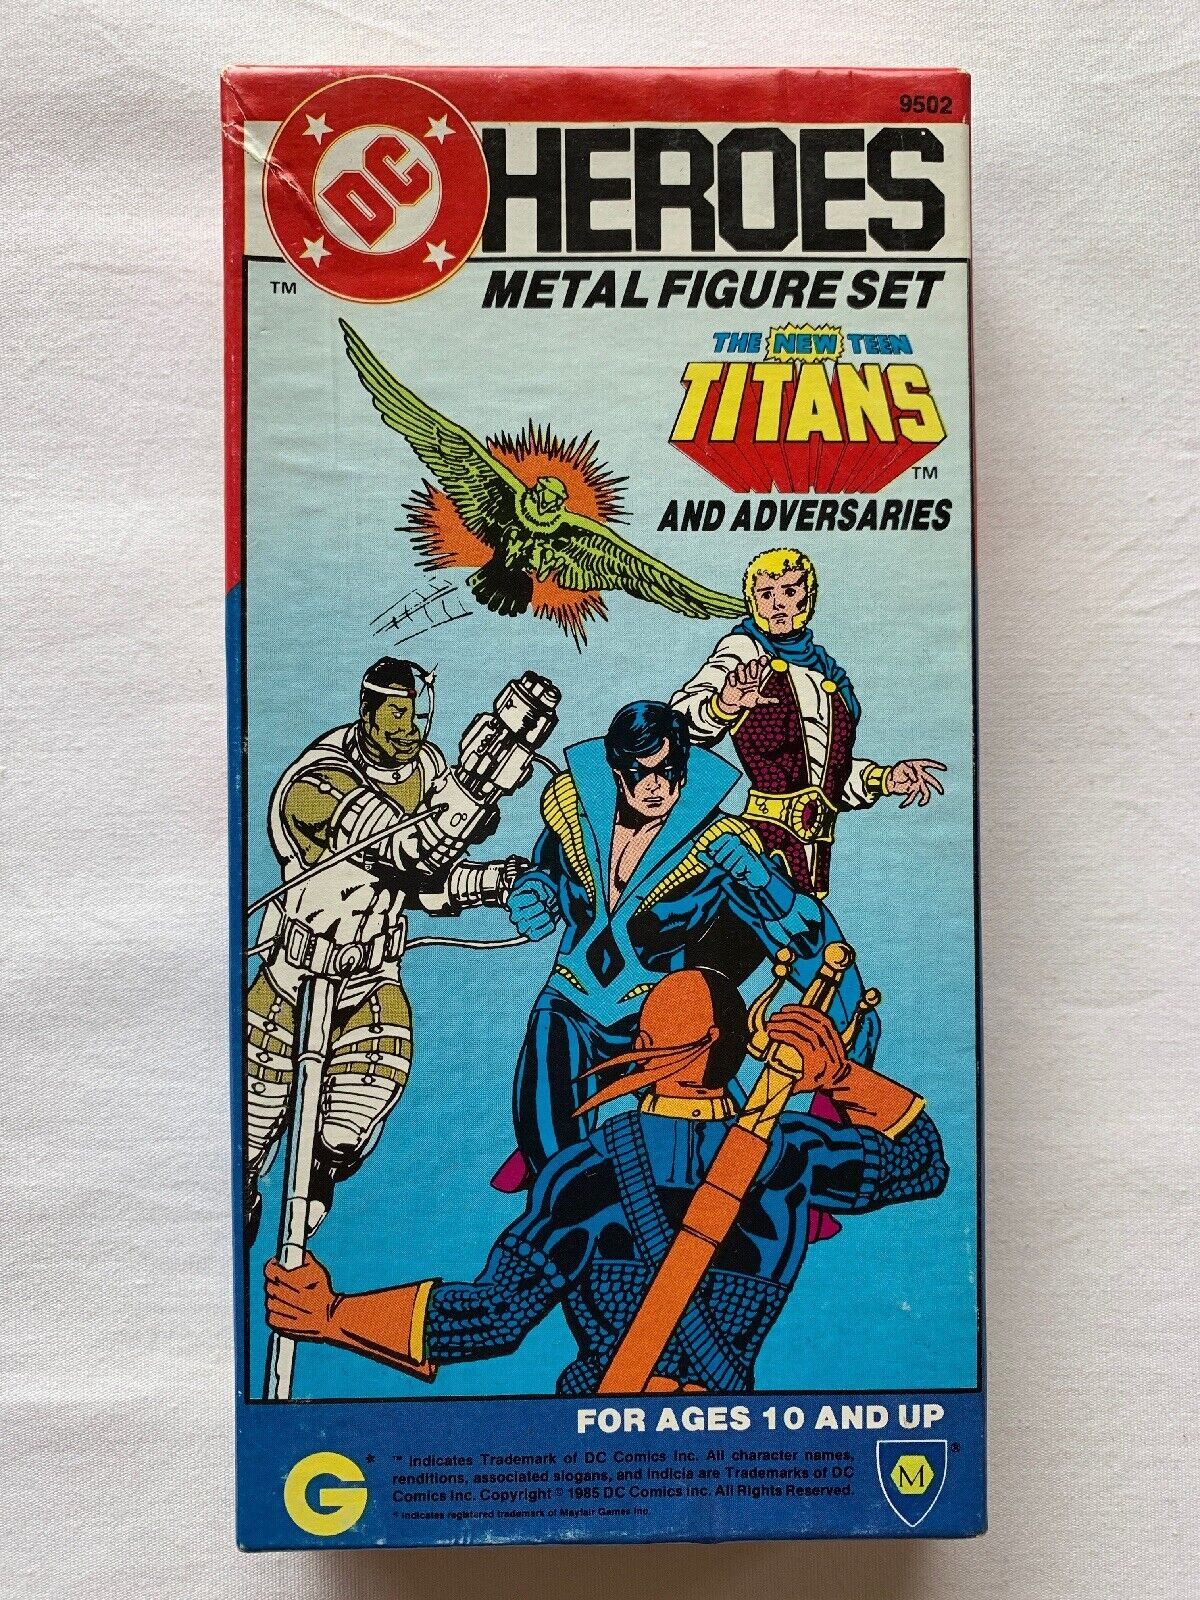 1985 DC Heroes Metal Figure Set - The New Teen Titans and Adversaries